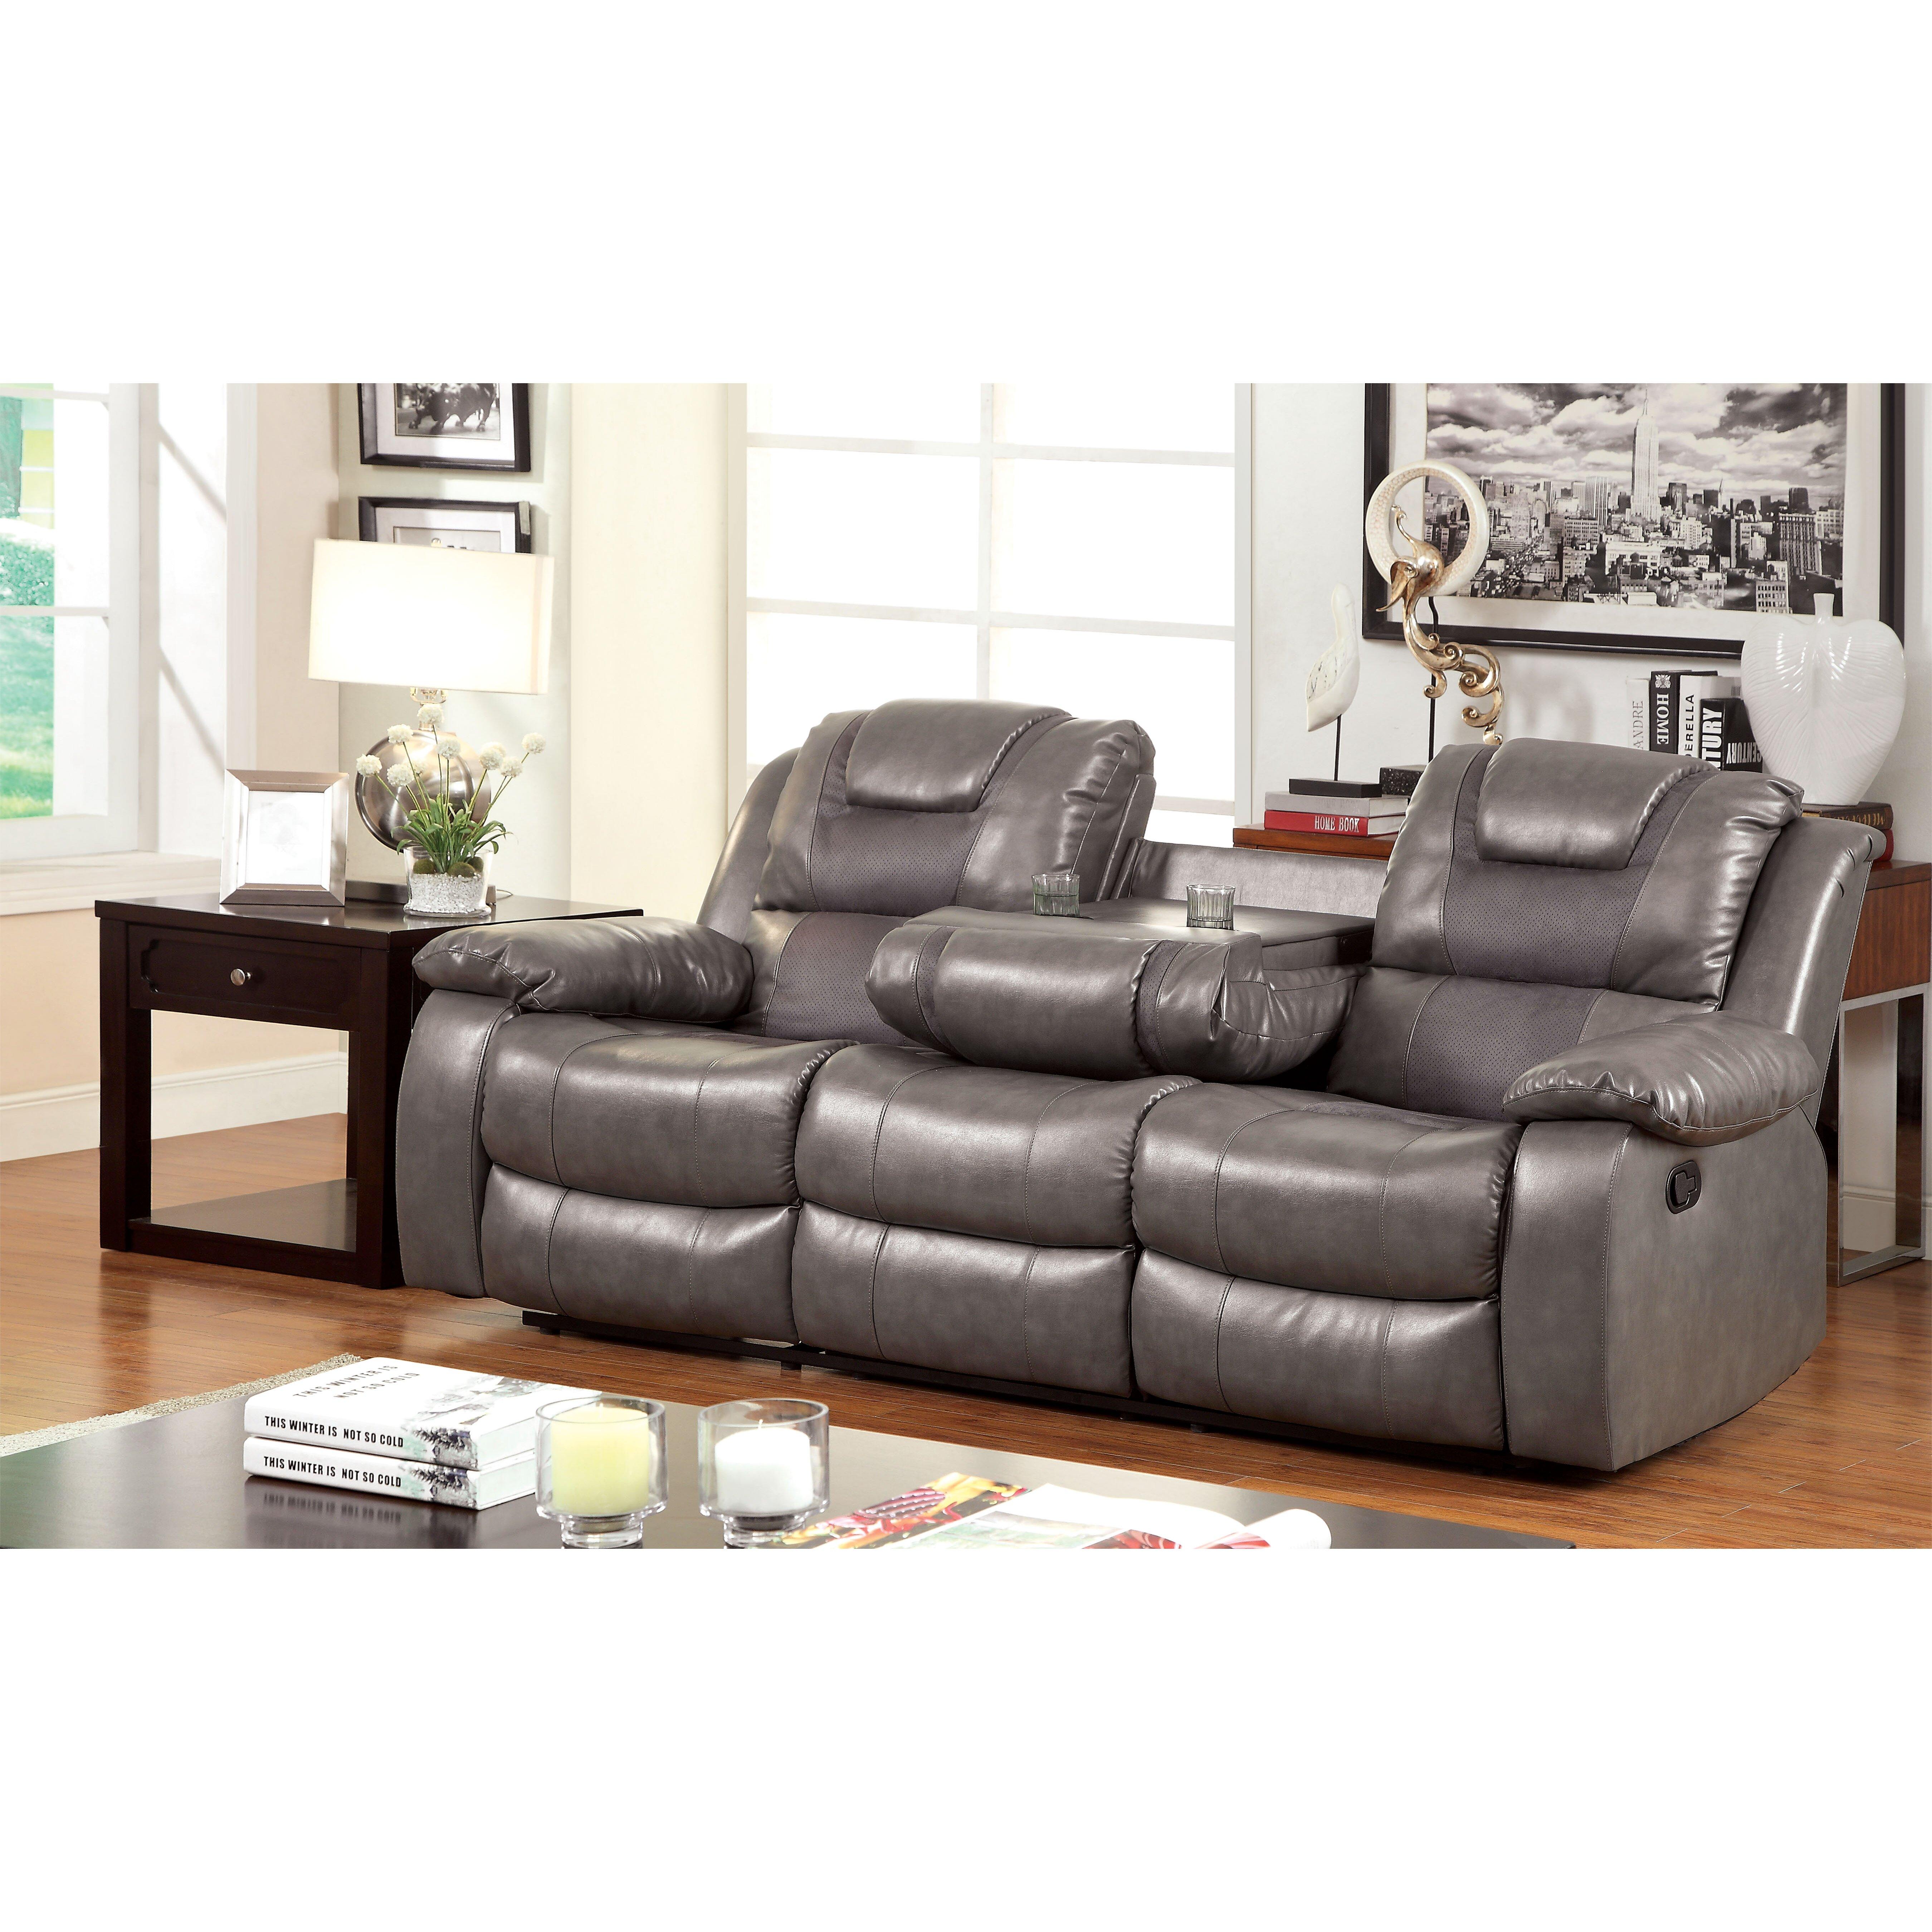 Hokku designs harrison living room collection reviews for Hokku designs living room furniture